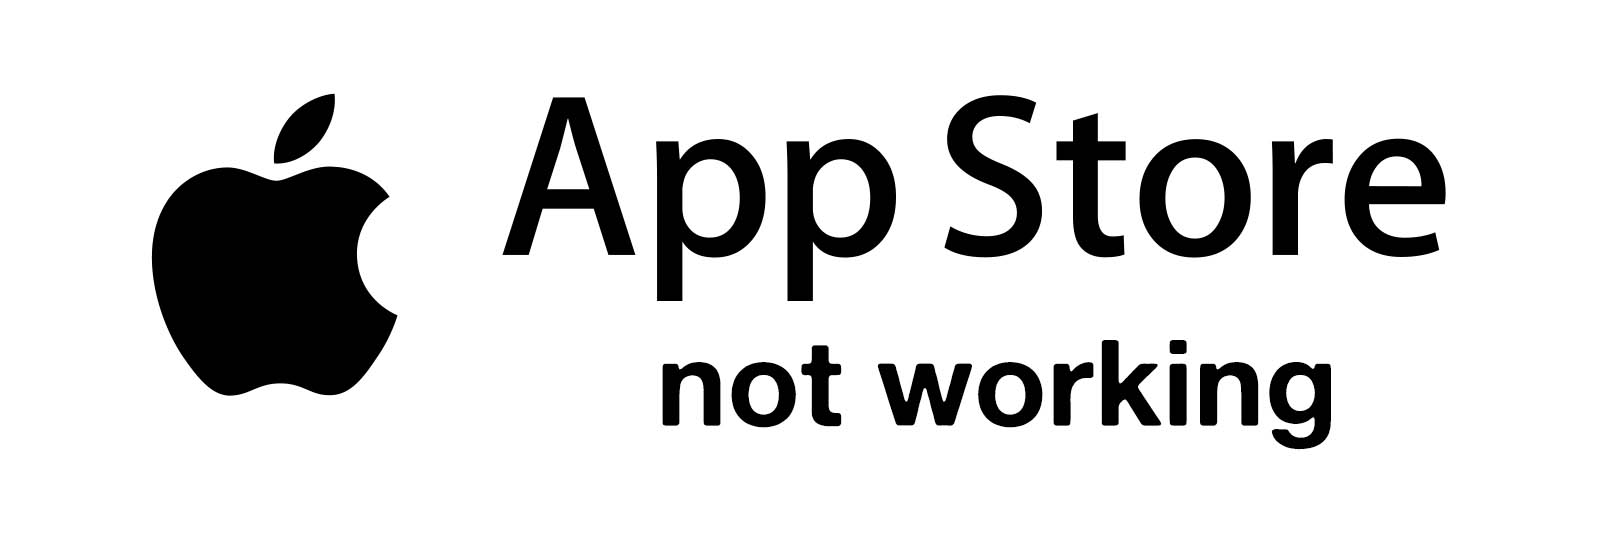 app-store-won't work